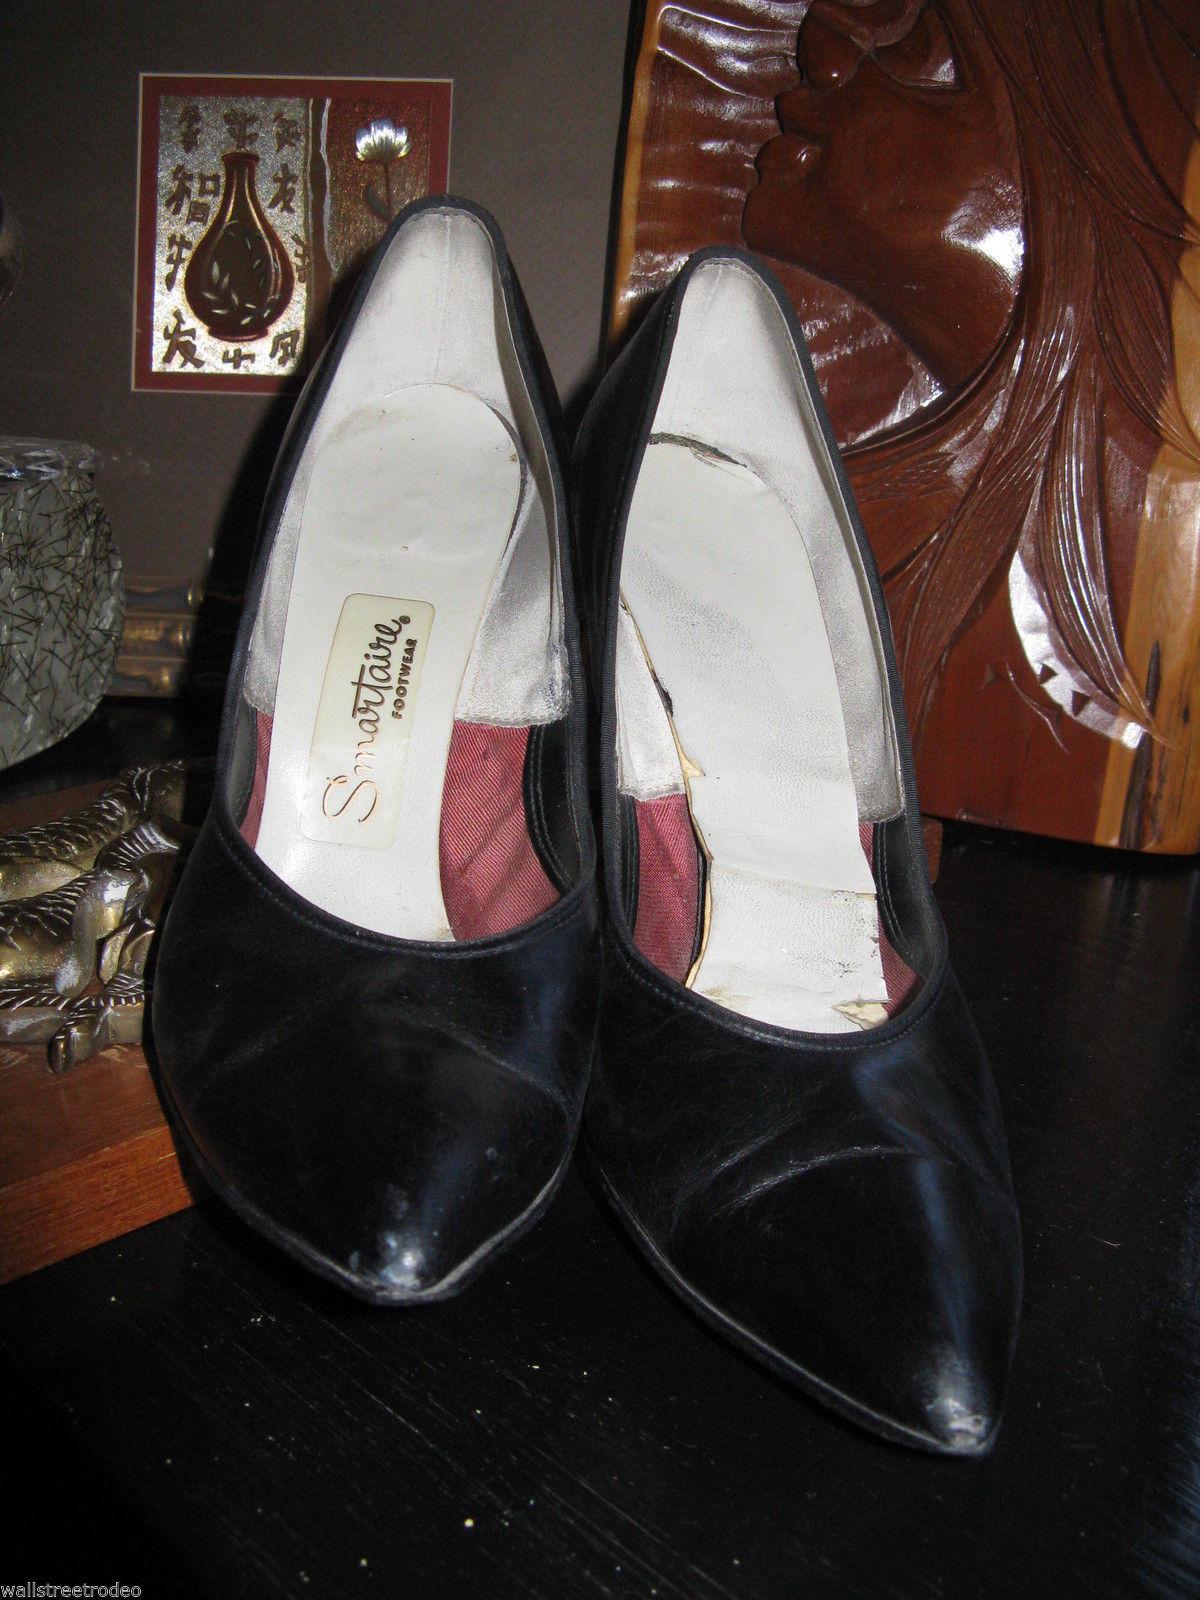 Smartaire vintage Debbie Renolds heels shoes 7 1/2 AAAA VLV 6 UK3.5 36 bonus VLV image 2